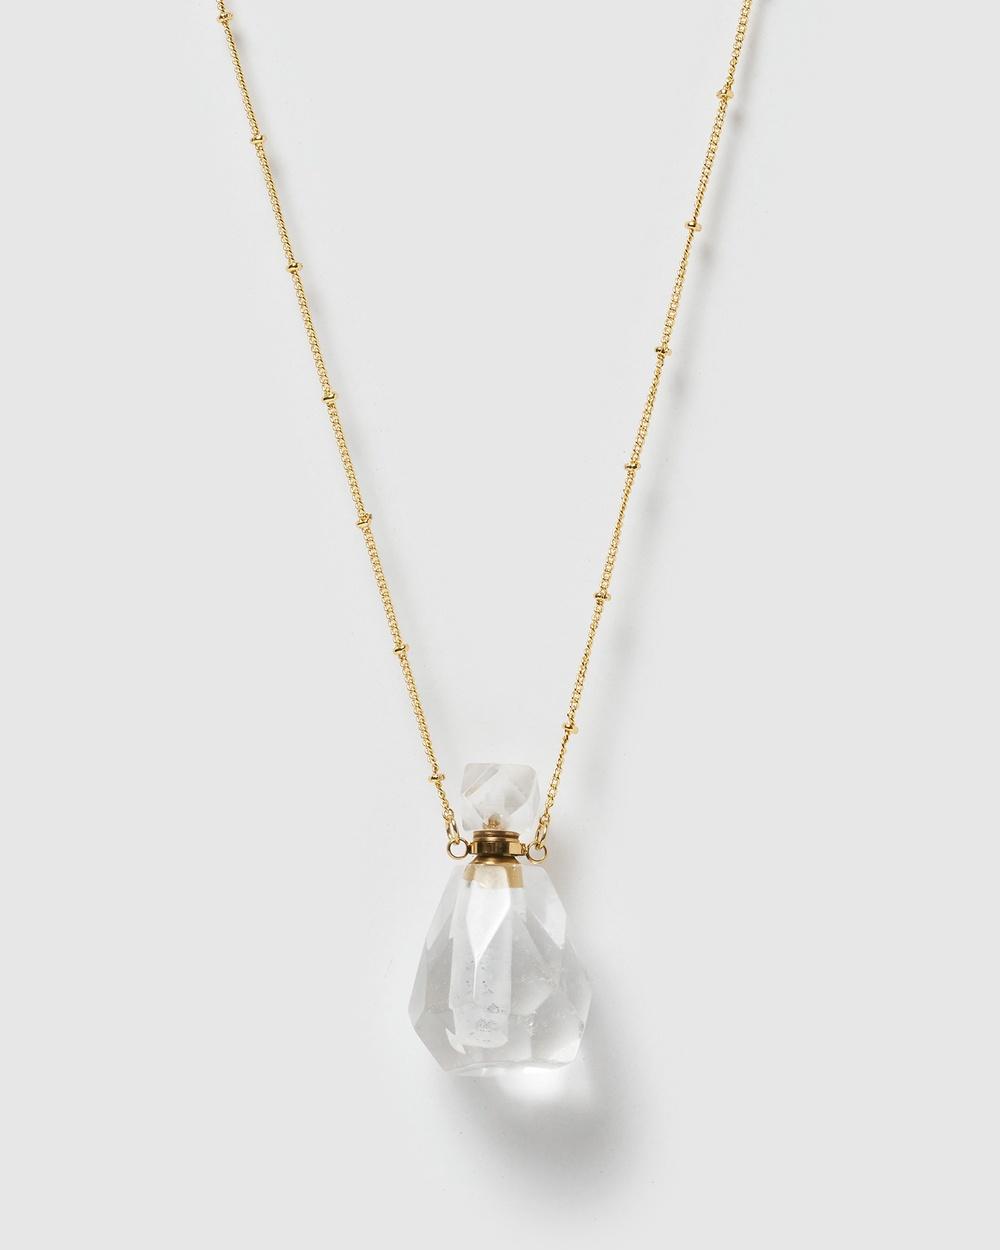 Miz Casa and Co Fantasy Pendant Perfume Bottle Necklace Jewellery Clear Quartz Gold